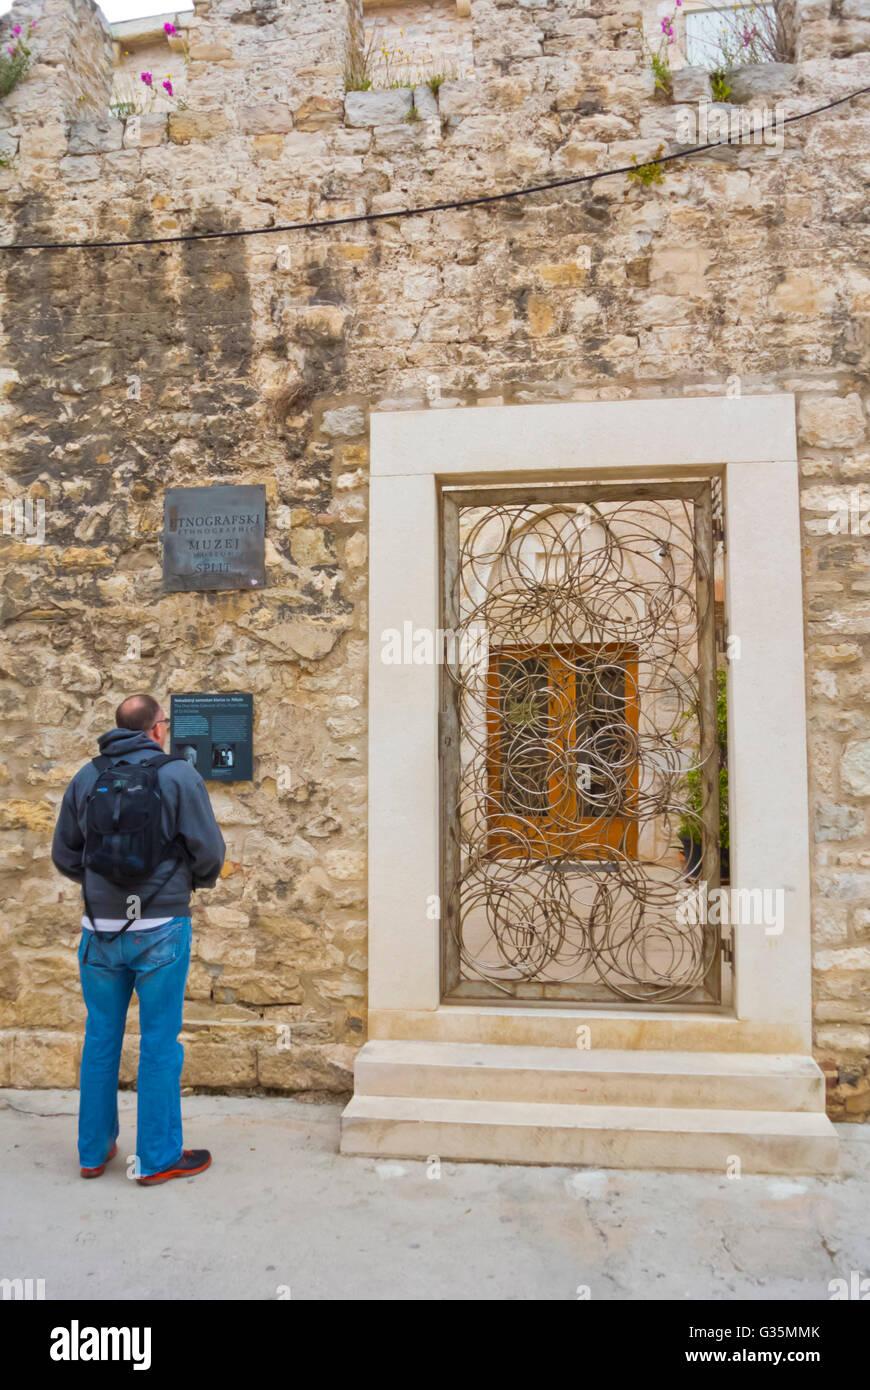 Museum of Ethnography, Grad, old town, Split, Dalmatia, Croatia - Stock Image